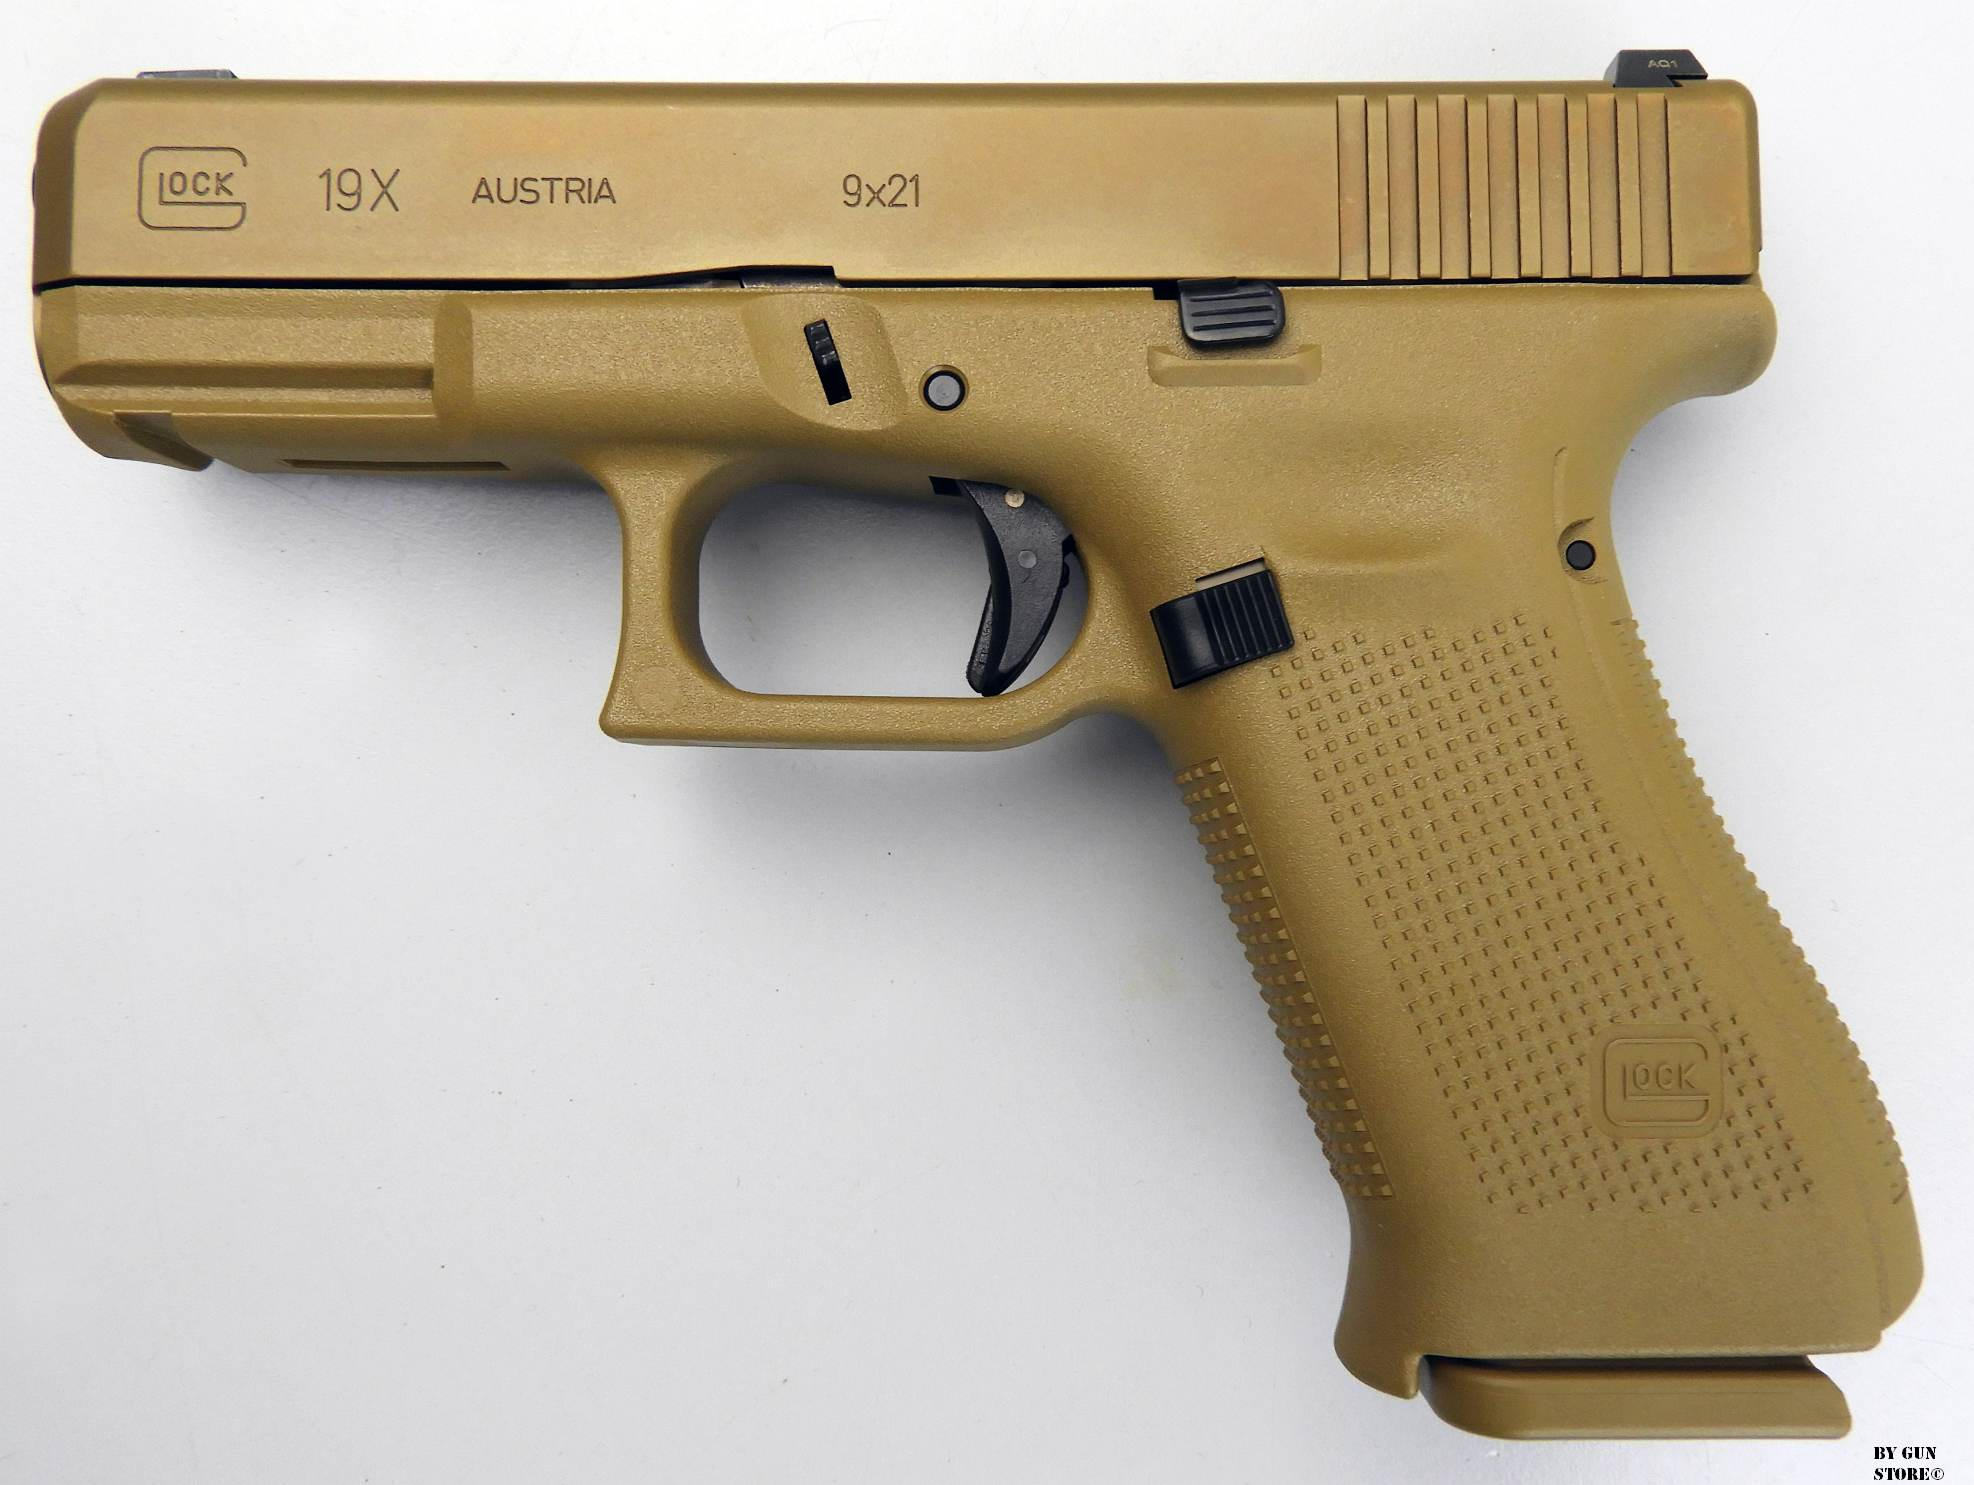 Gun Store Bunker Ego Sum Bellum Pistola Glock Mod 19 X Cal